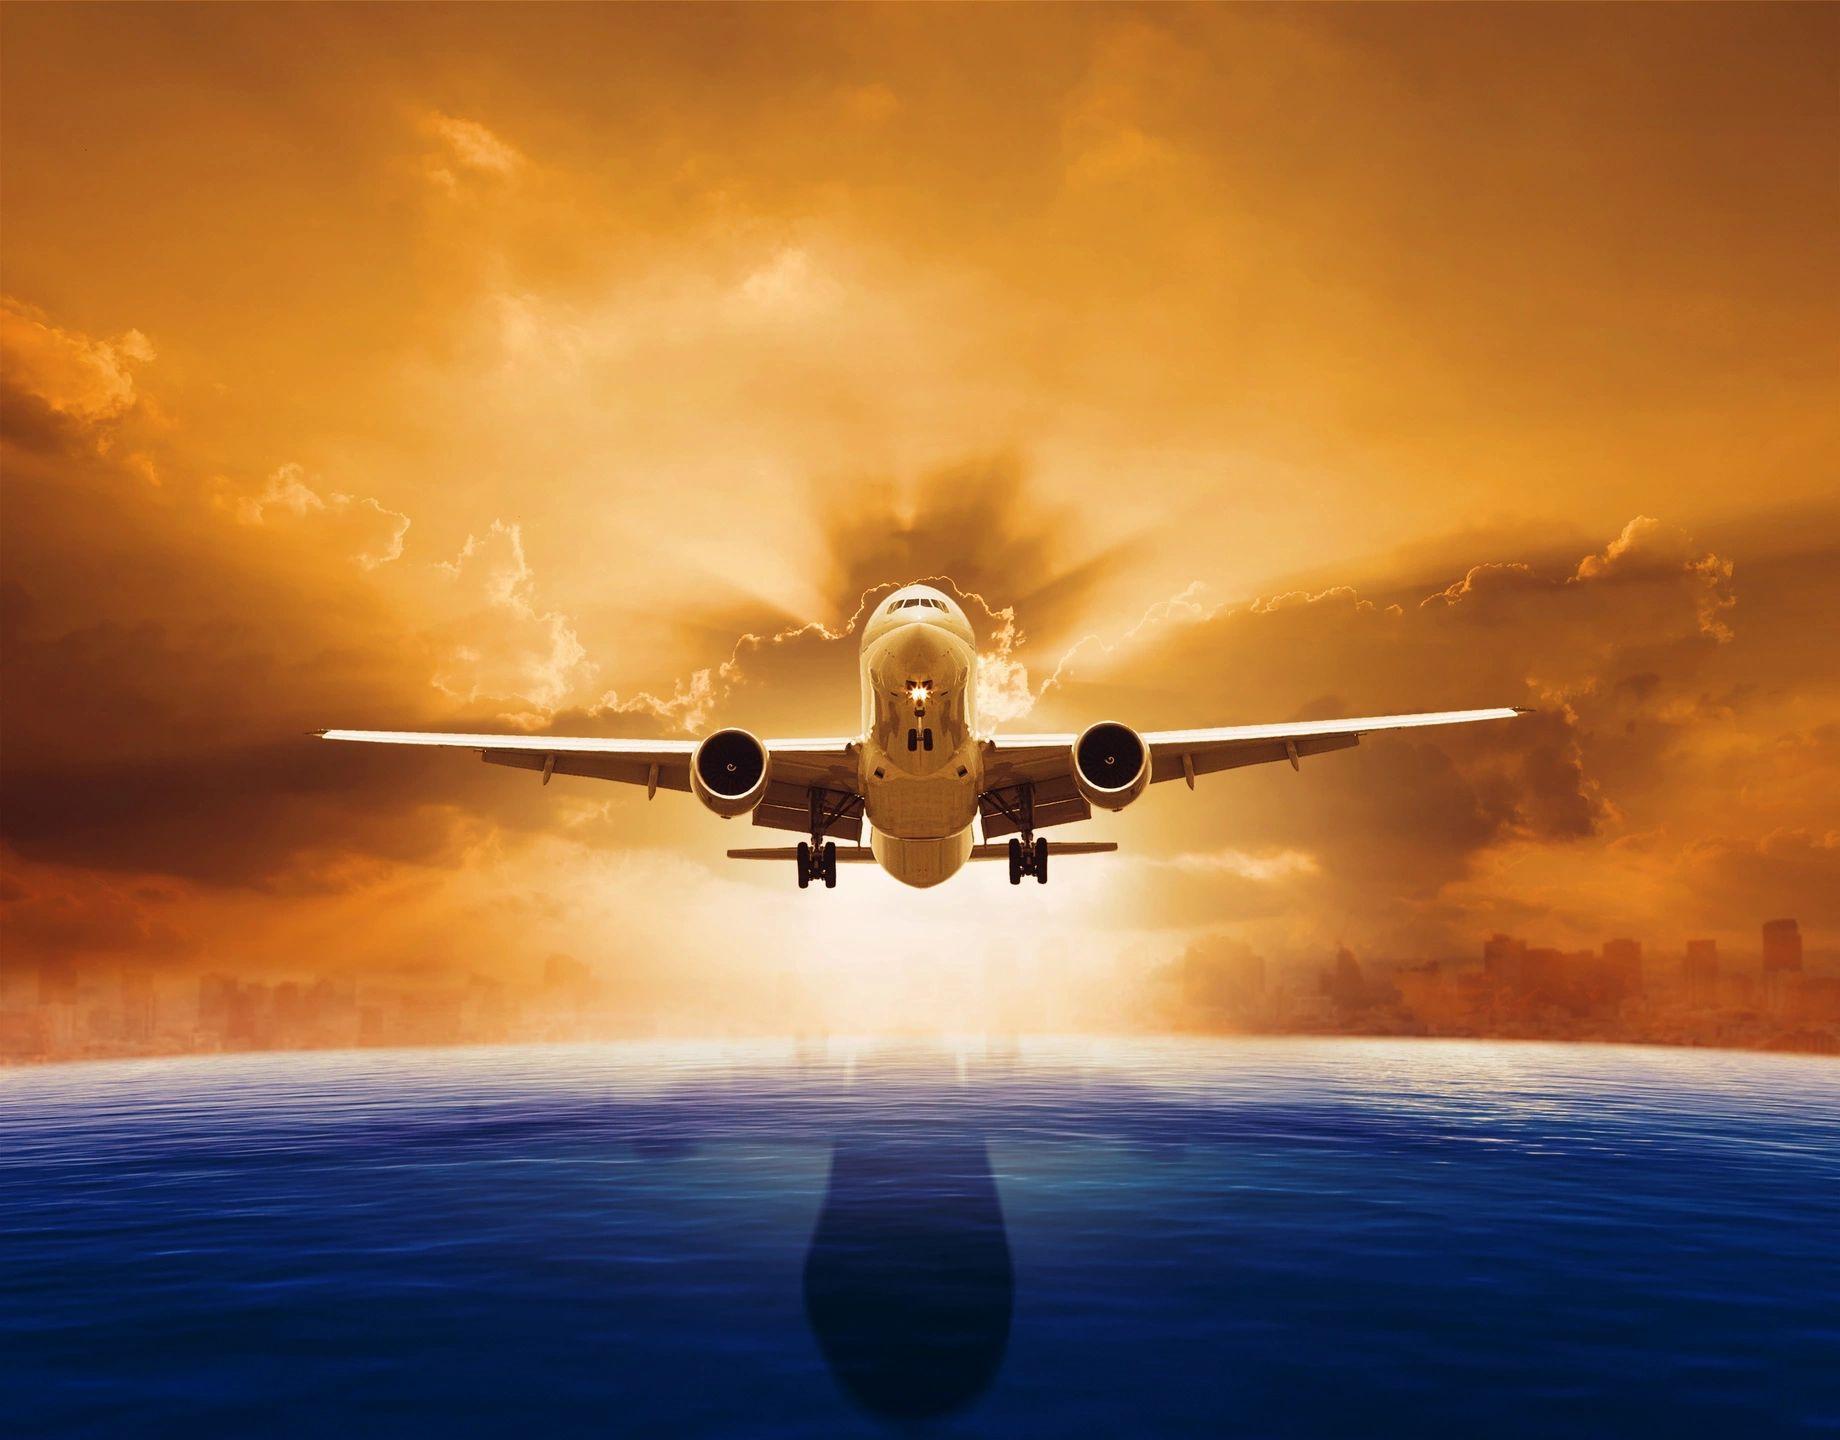 All2fly LLC - Career Pilot Program, Pilot Training, Learn to Fly